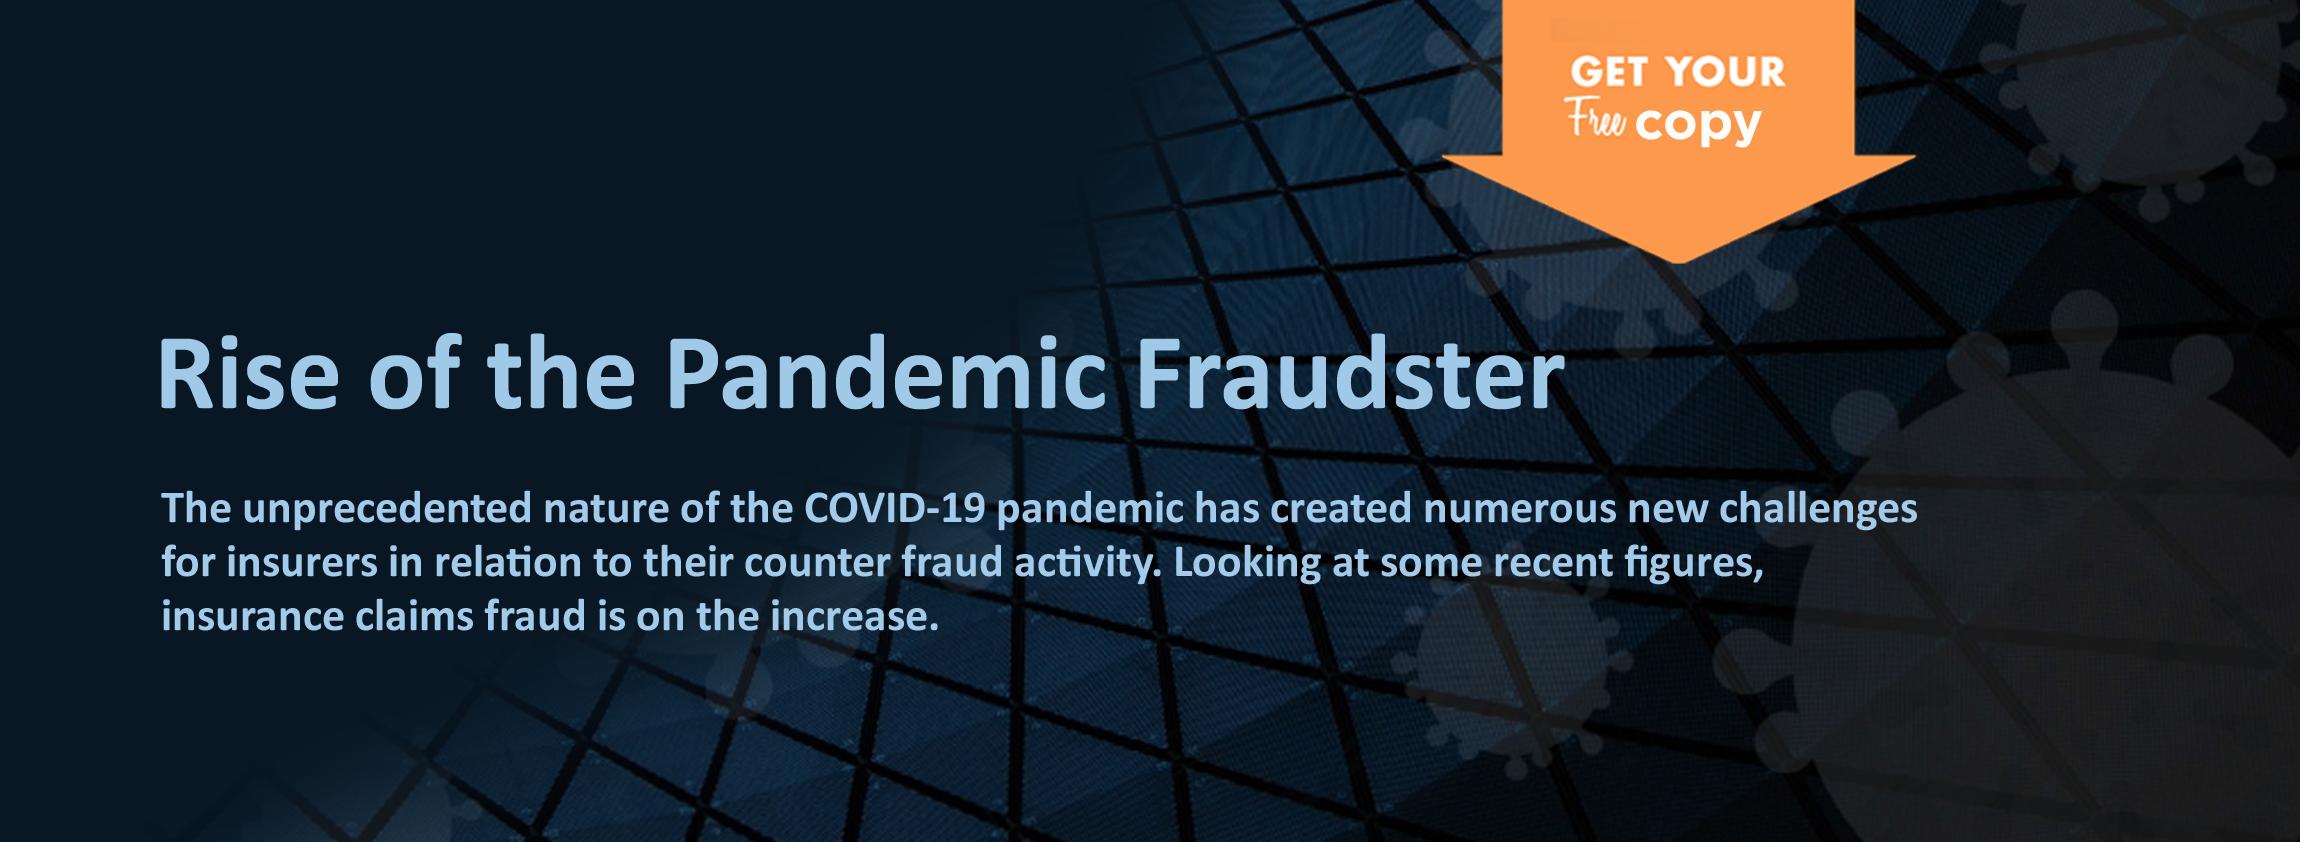 top-landing-rise-pandemic-fraudster-7-1